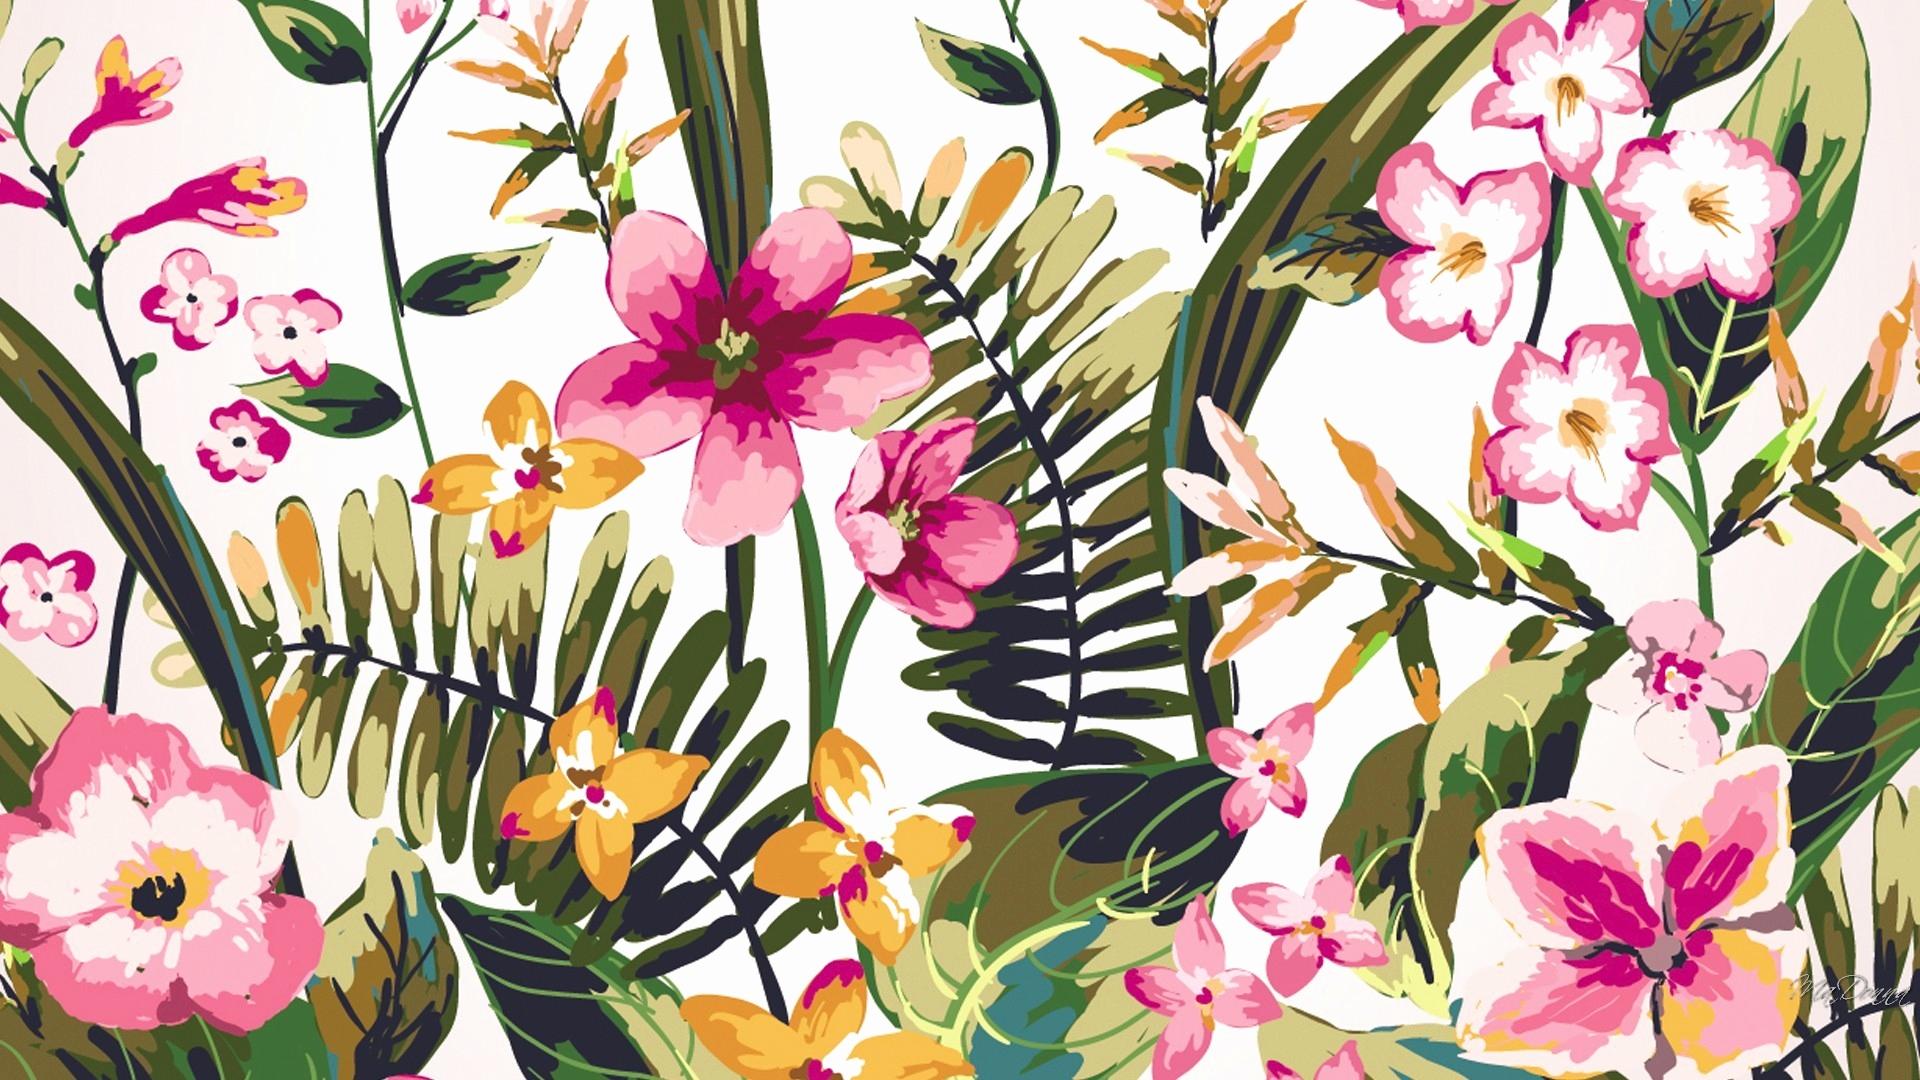 Background Desktop Watercolour Flowers 1920x1080 Download Hd Wallpaper Wallpapertip